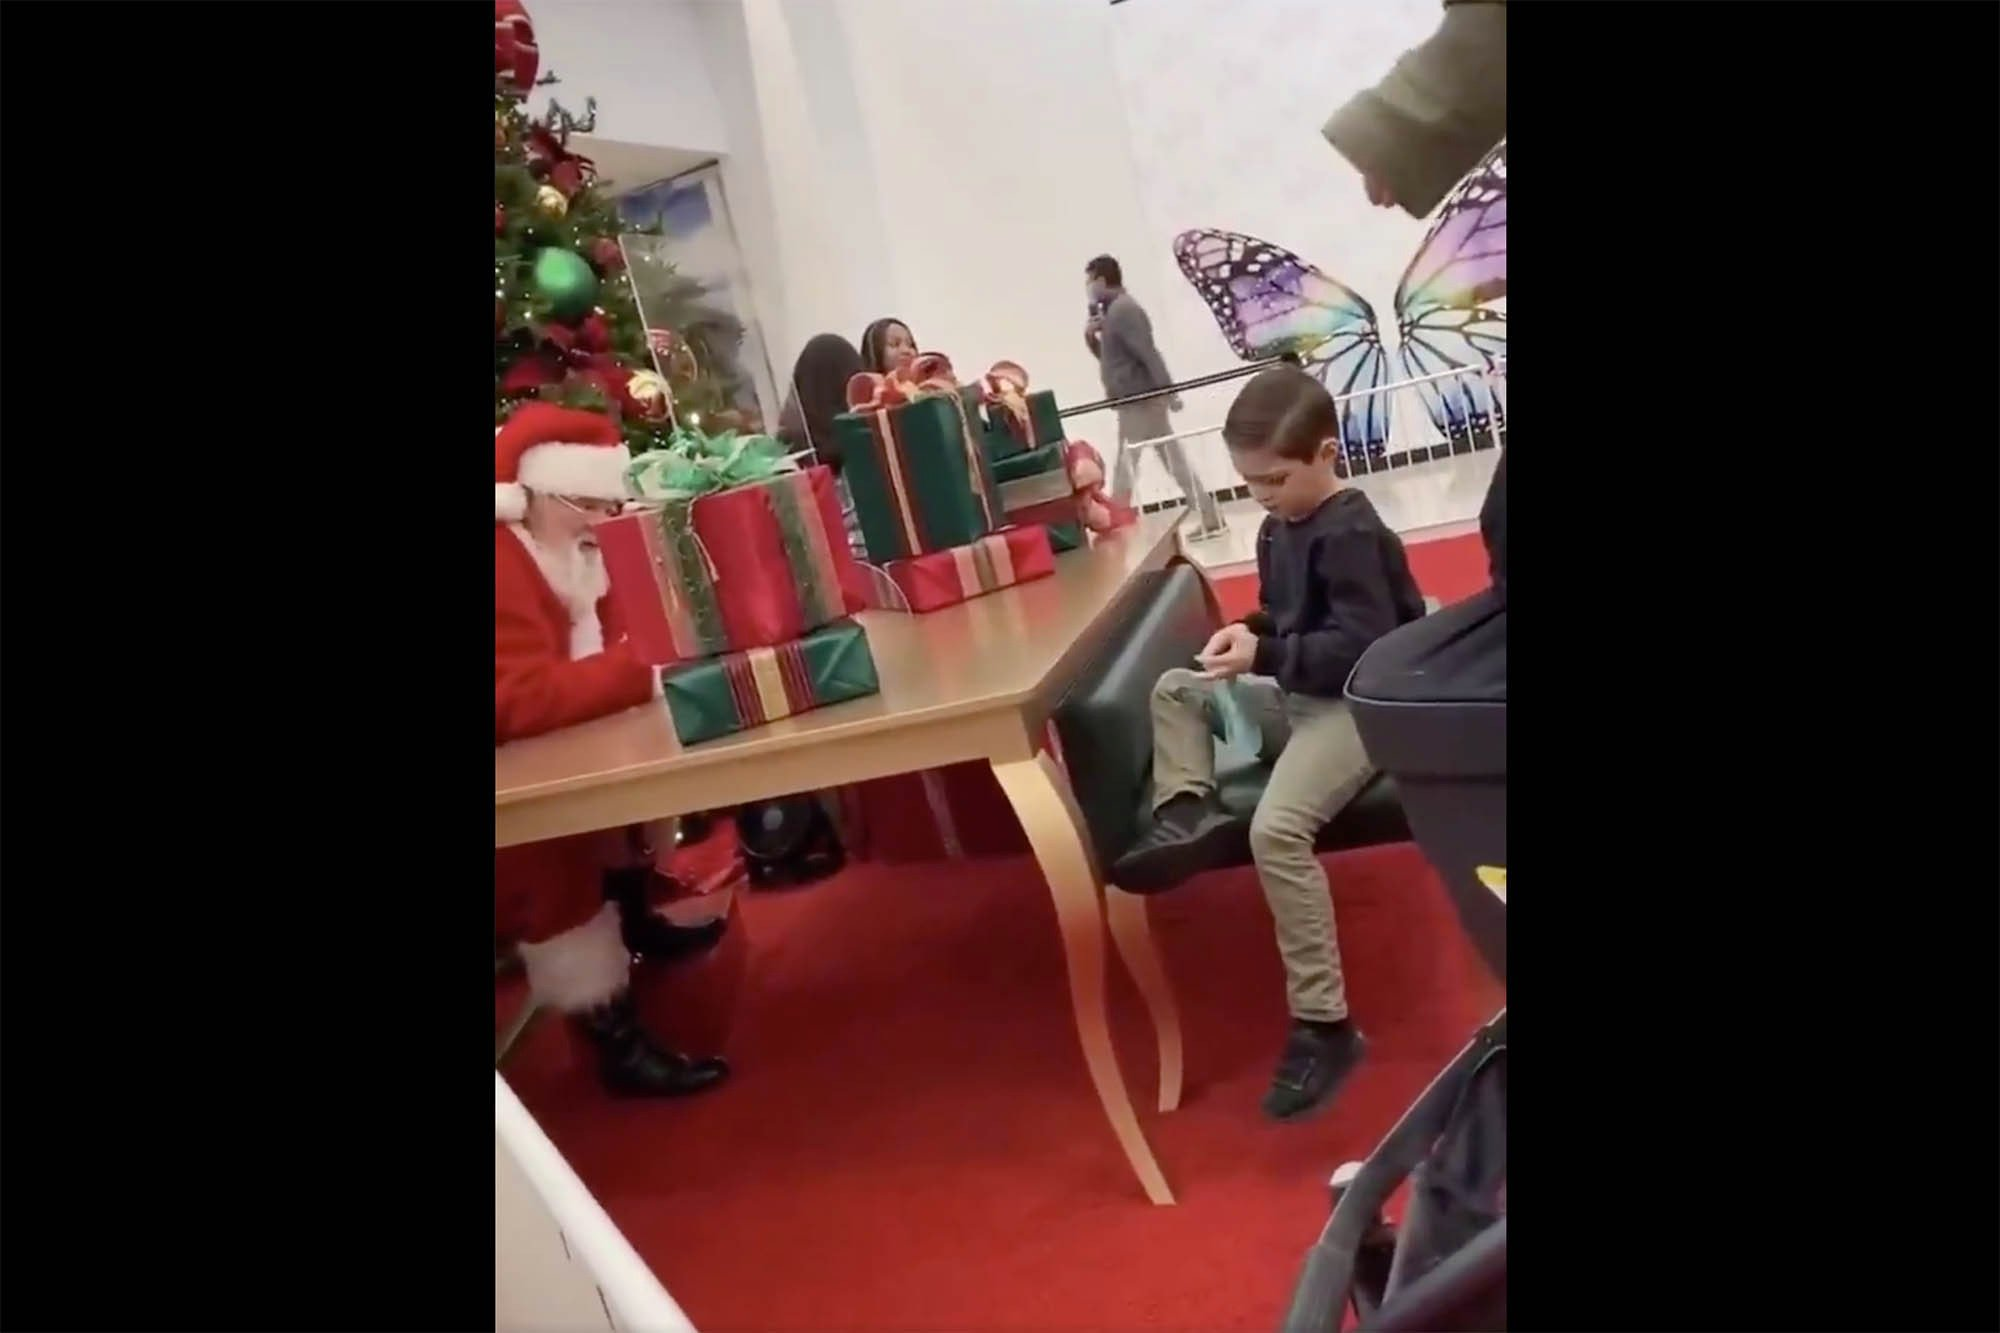 Politically correct Santa tells crying kid he won